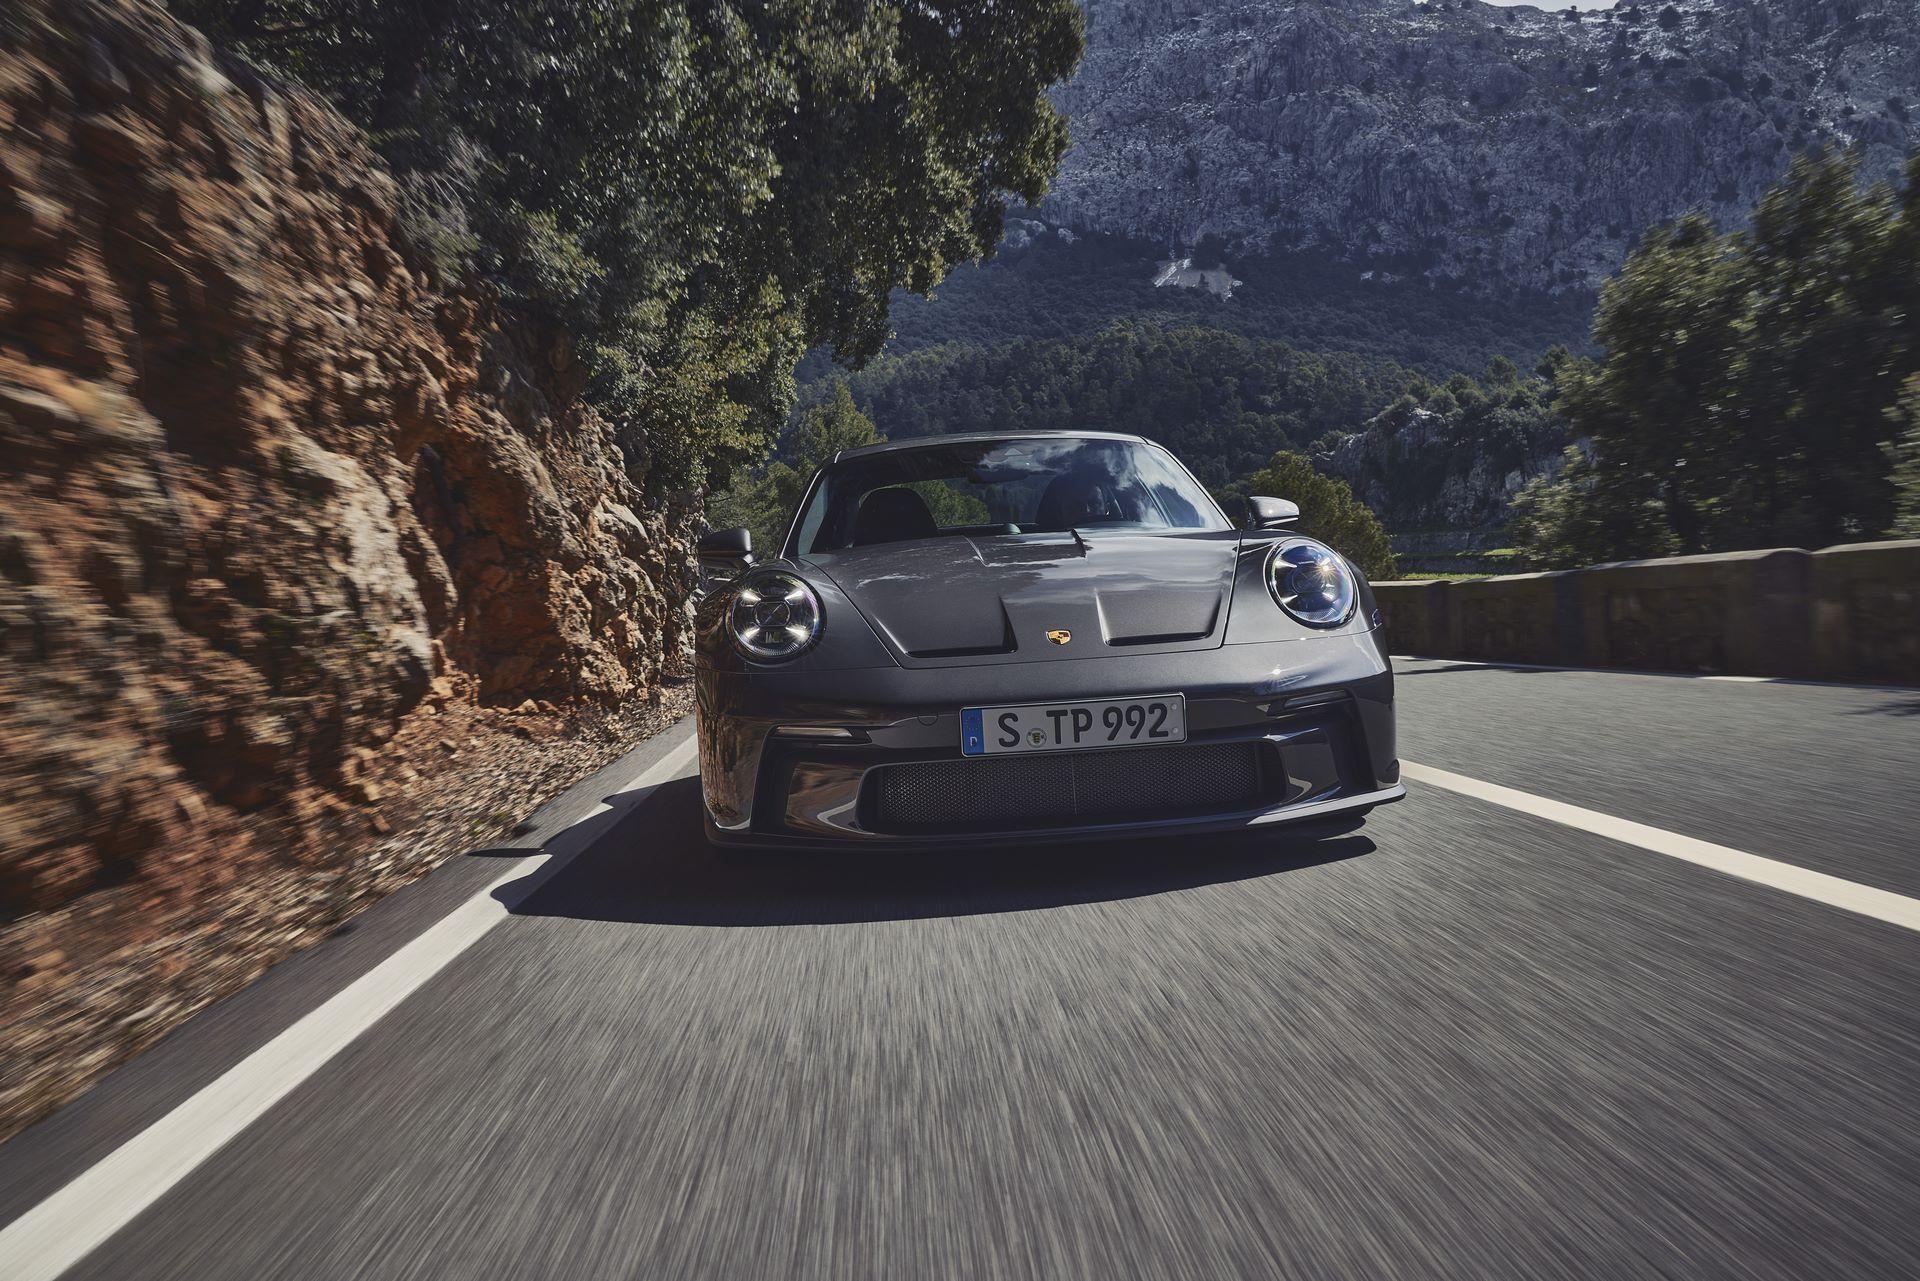 Porsche-911-GT3-Touring-Package-12